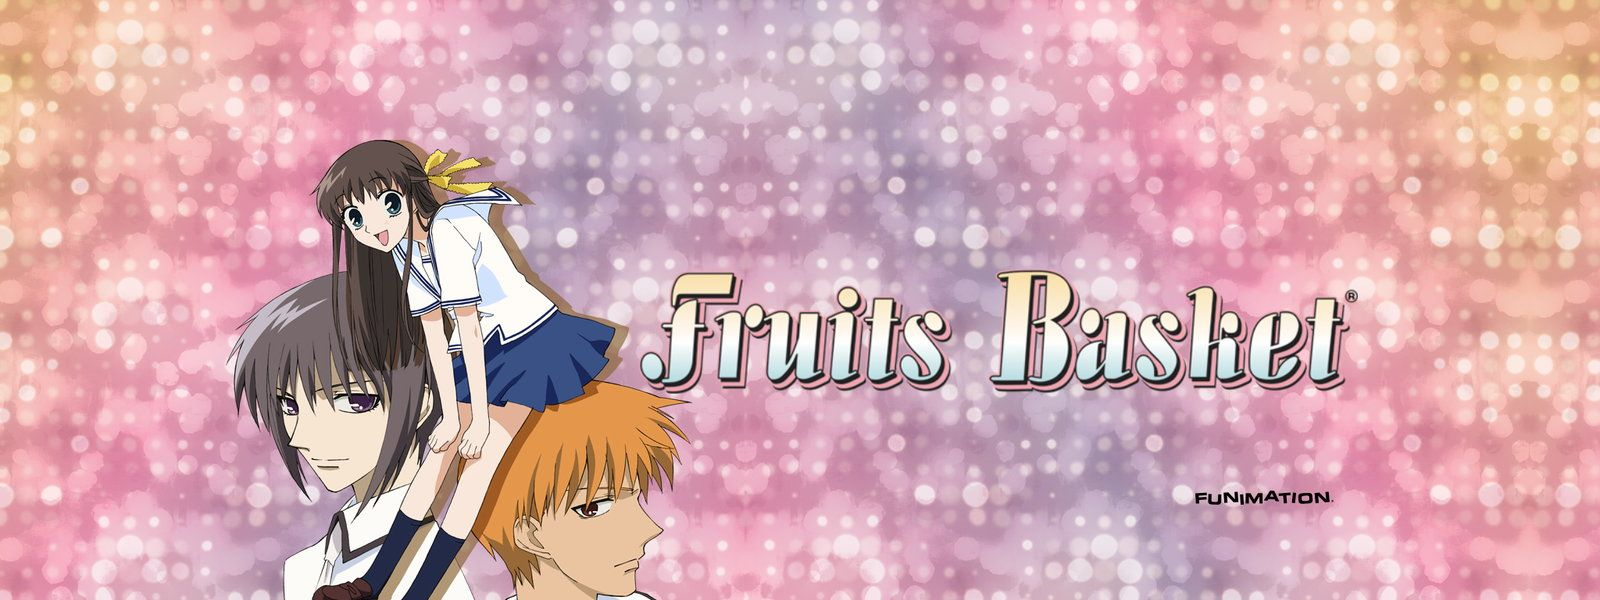 Watch Fruits Basket online Free Hulu Fruits basket